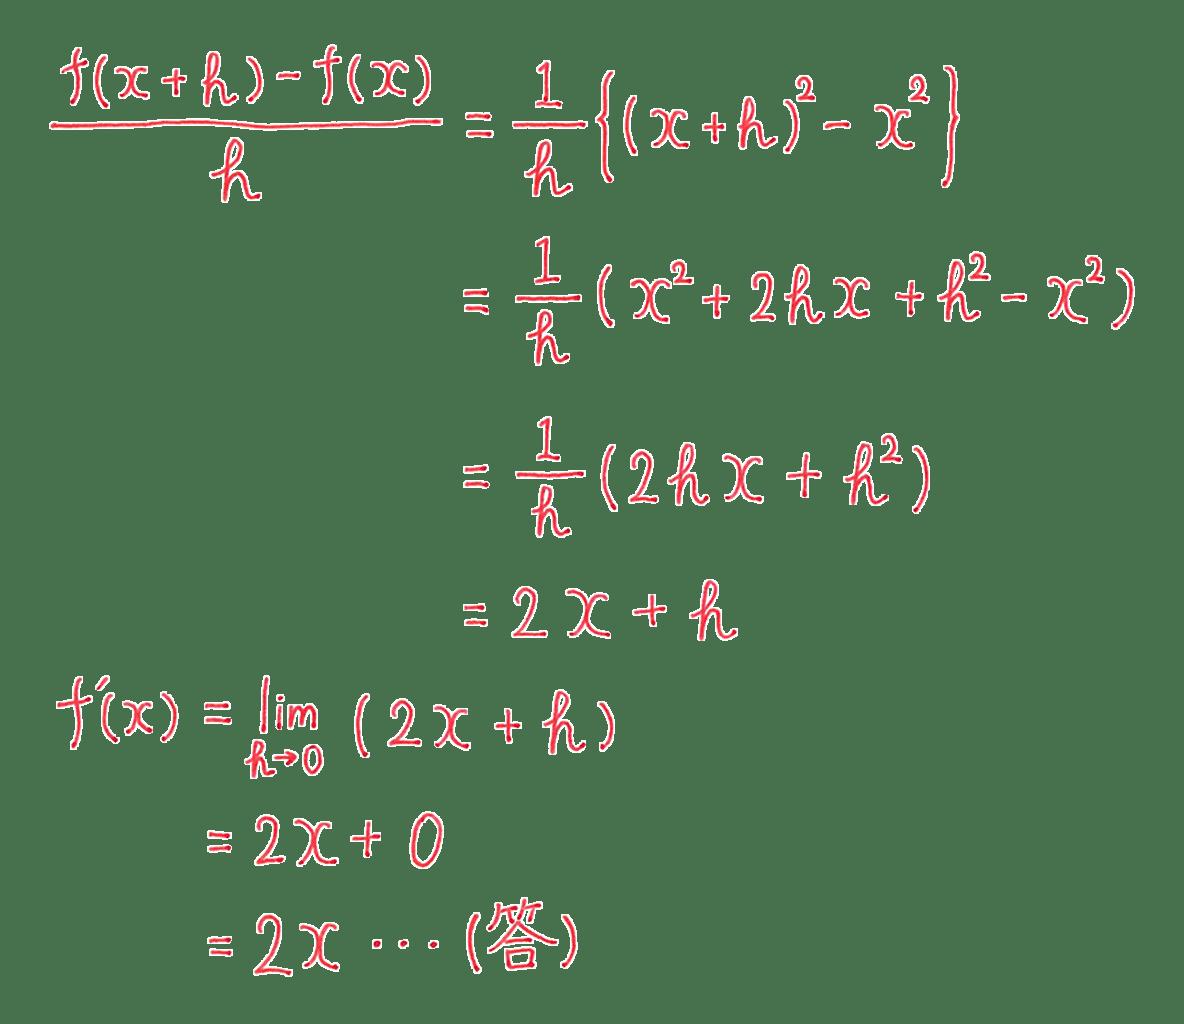 高校数学Ⅱ 微分法と積分法4 例題 答え